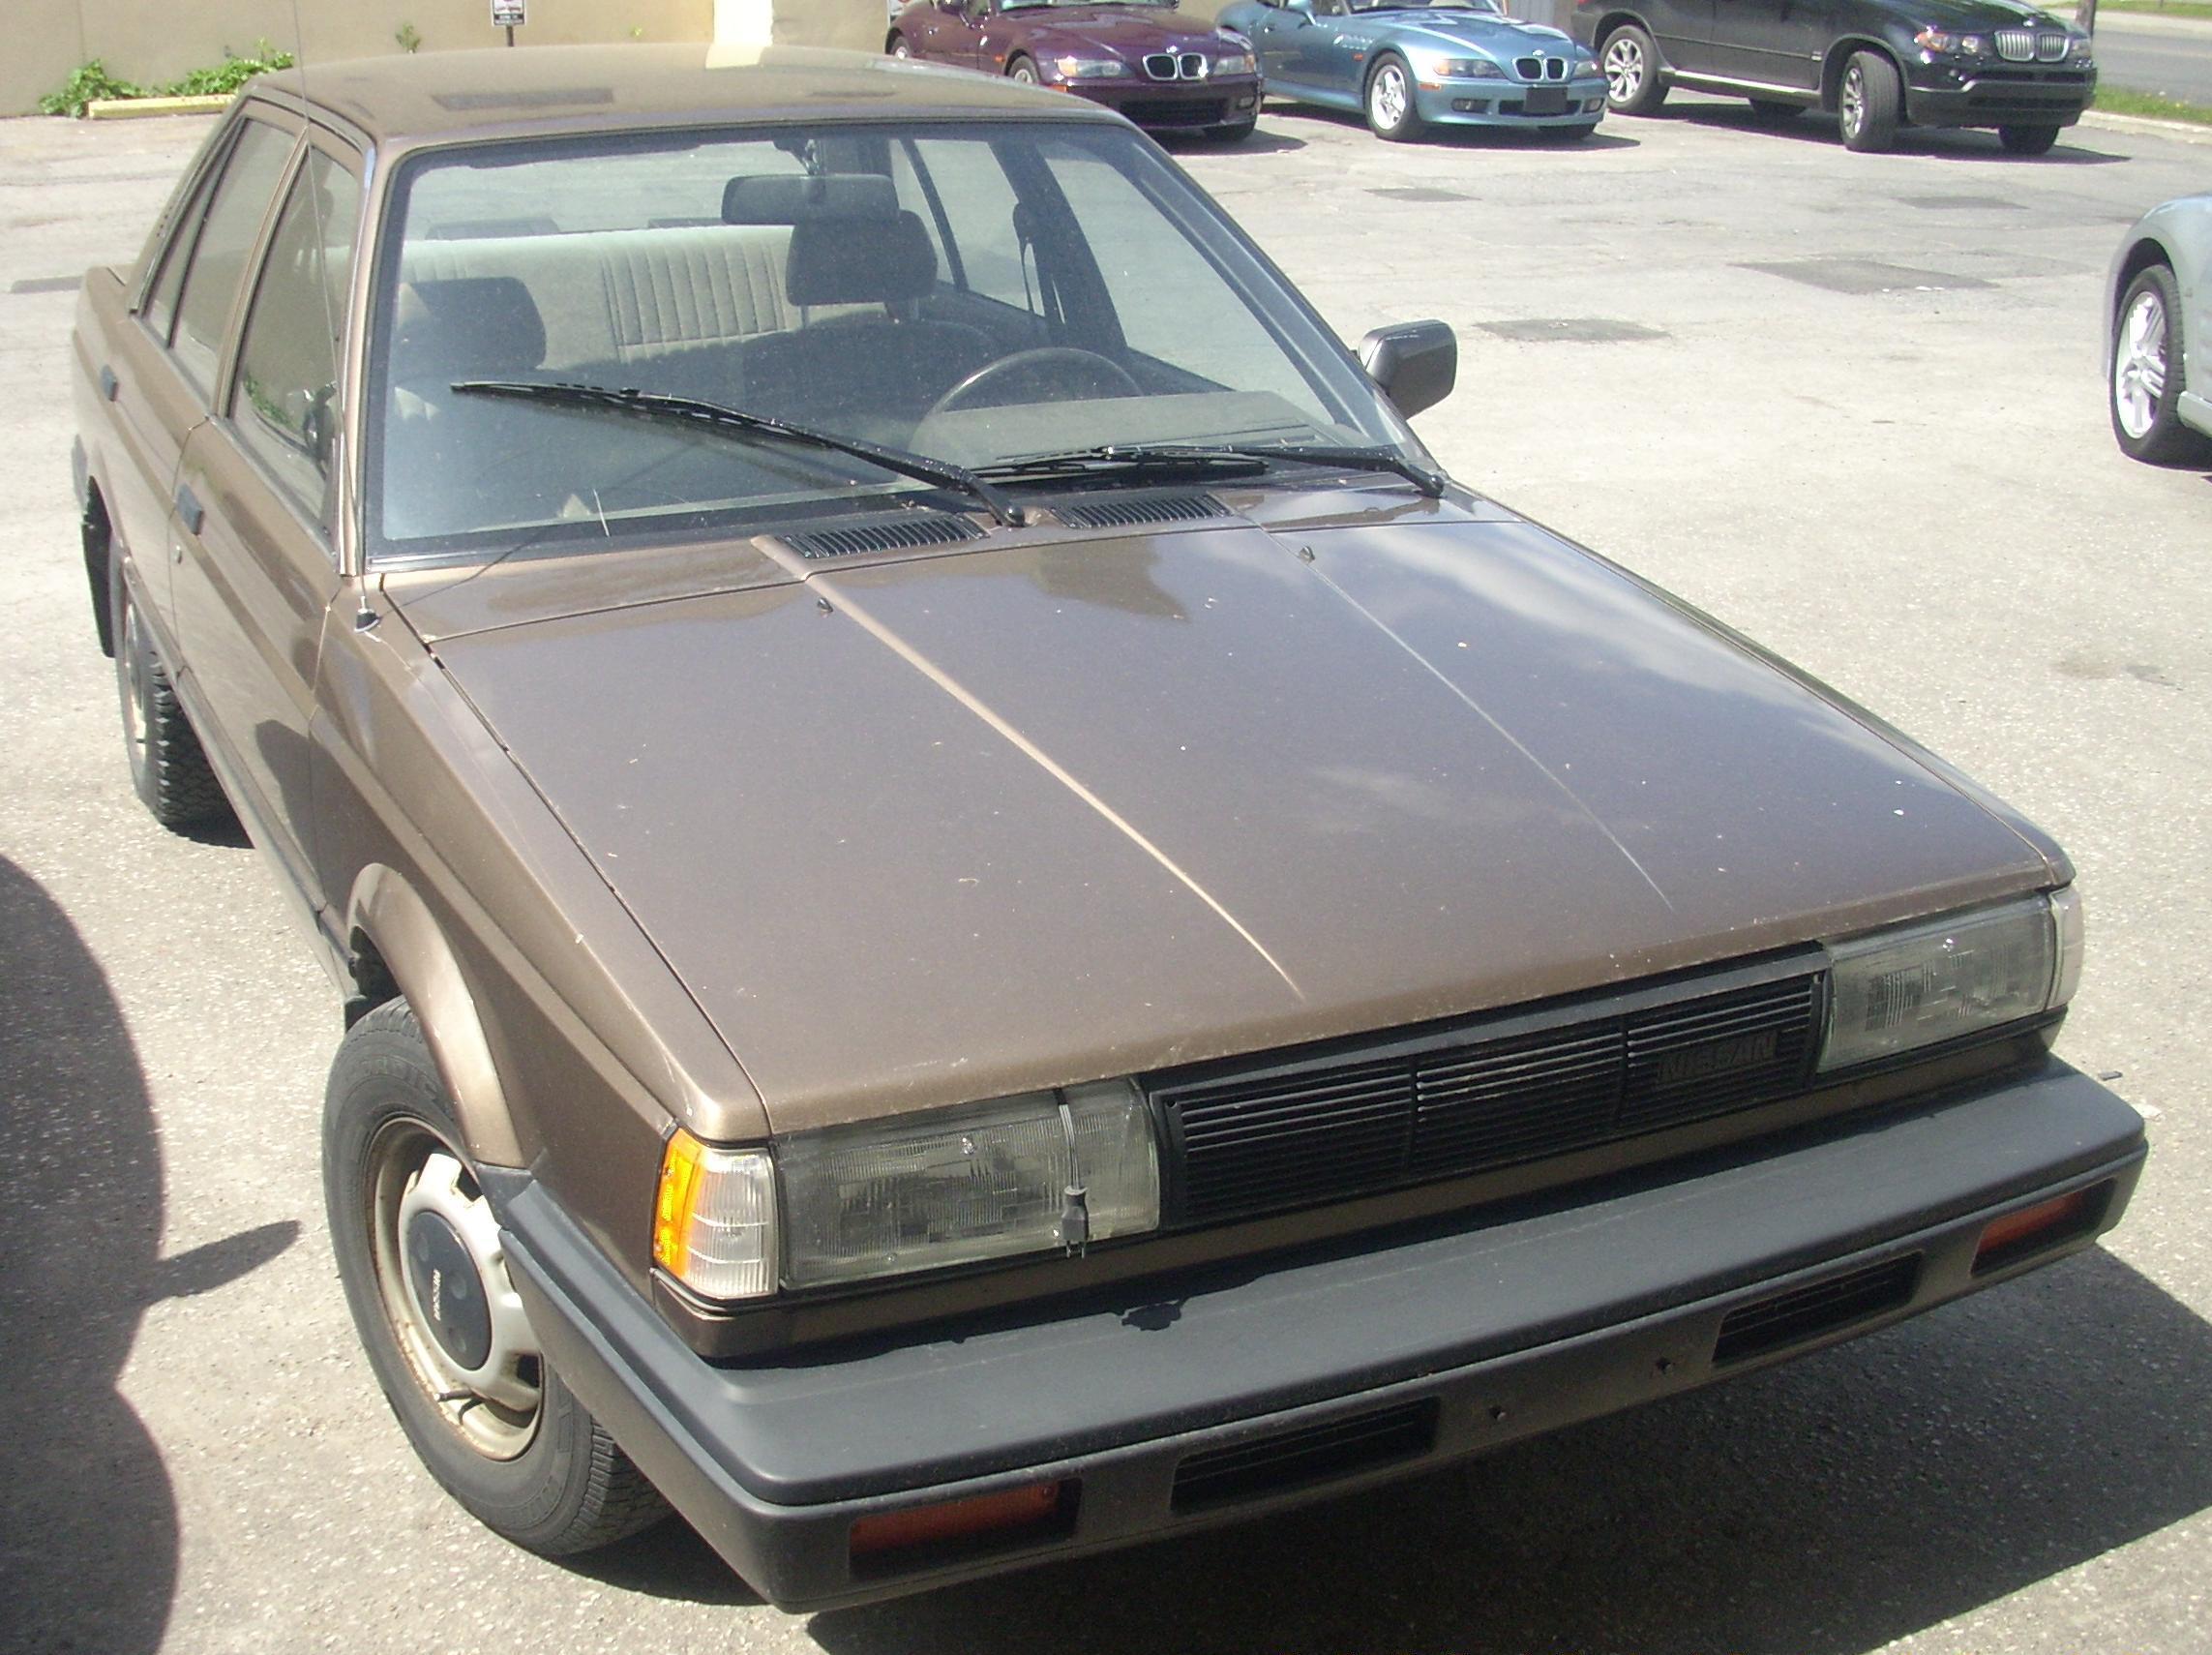 File:'87-'88 Nissan Sentra Sedan.JPG - Wikimedia Commons